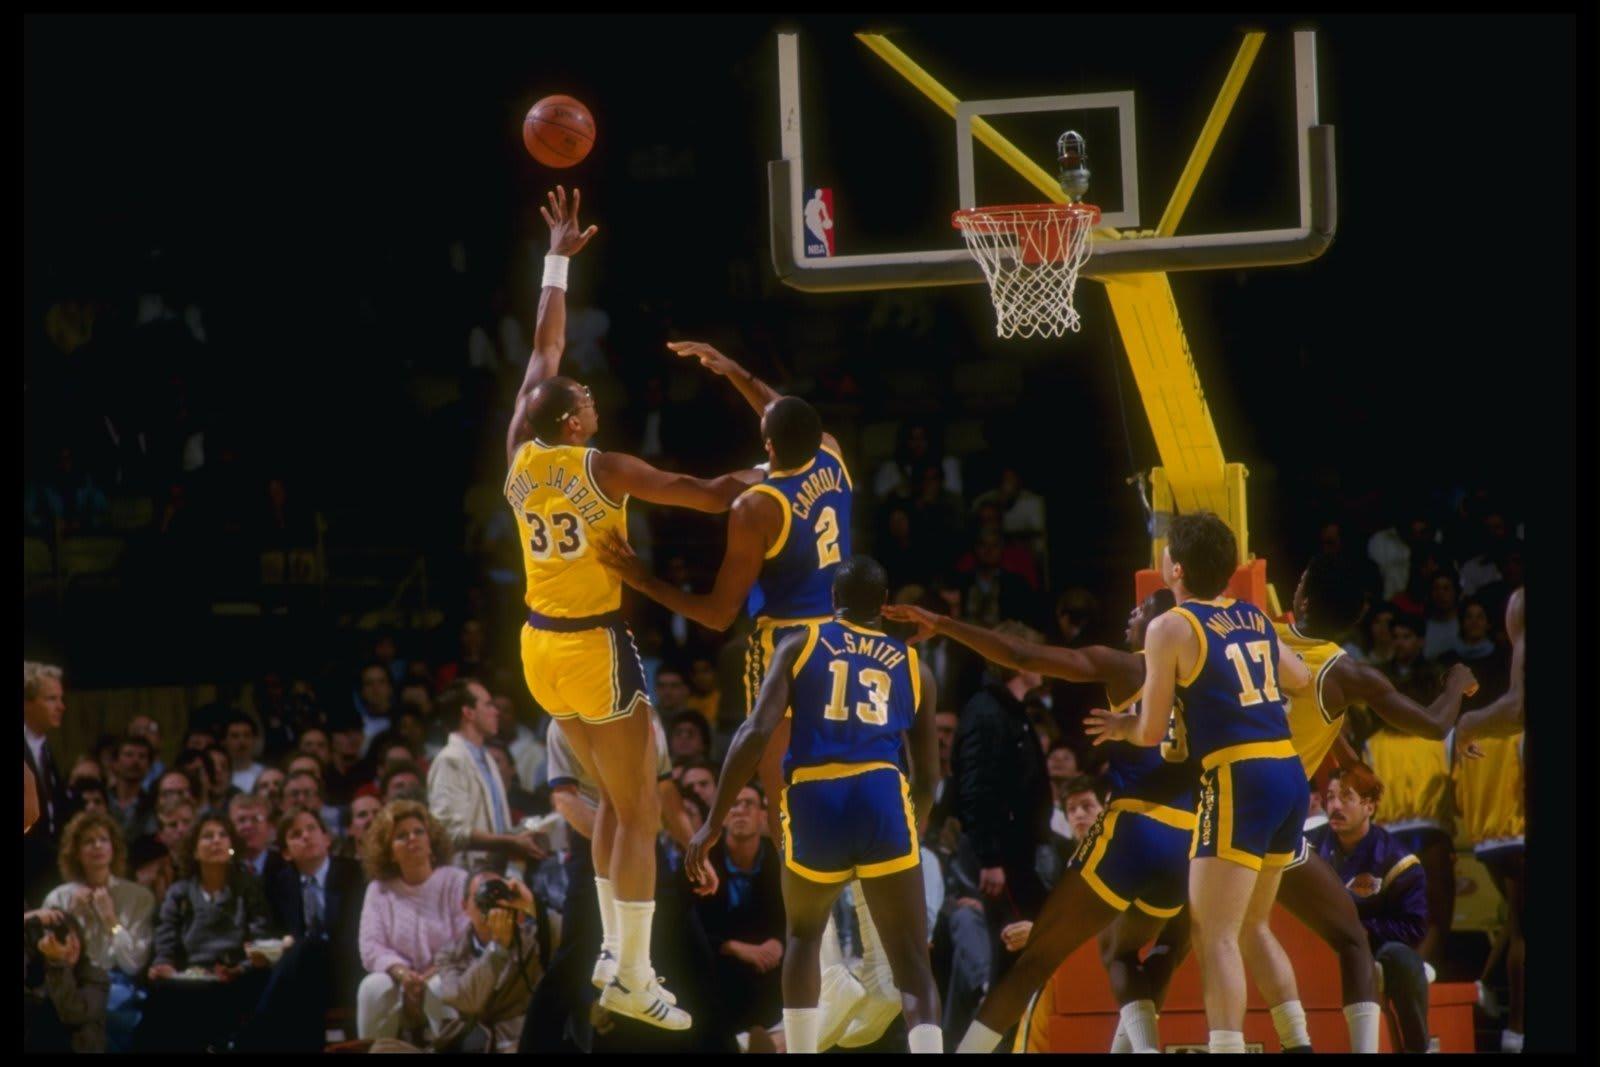 Kareem Abdul-Jabbar, Phoenix Suns (Mandatory Credit: Rick Stewart /Allsport Mandatory Credit: Rick Stewart /Allsport